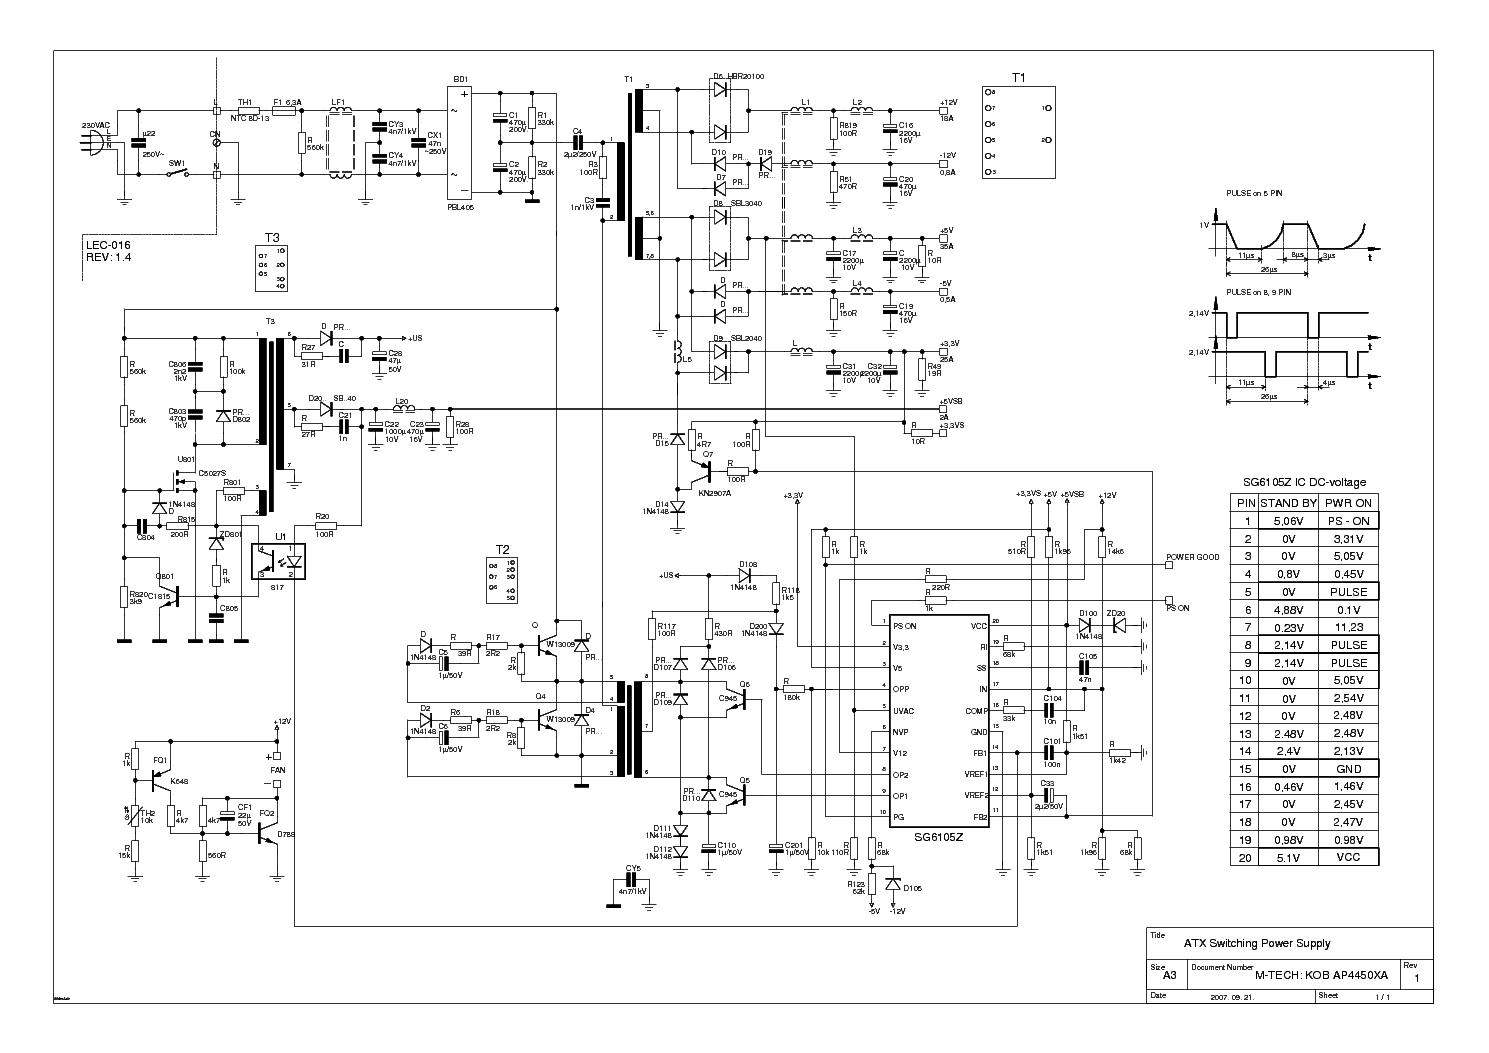 hight resolution of kobap4450xa 450w atx power supply schematic circuit diagram wiring wiring diagram for kobalt compressor kobap4450xa 450w